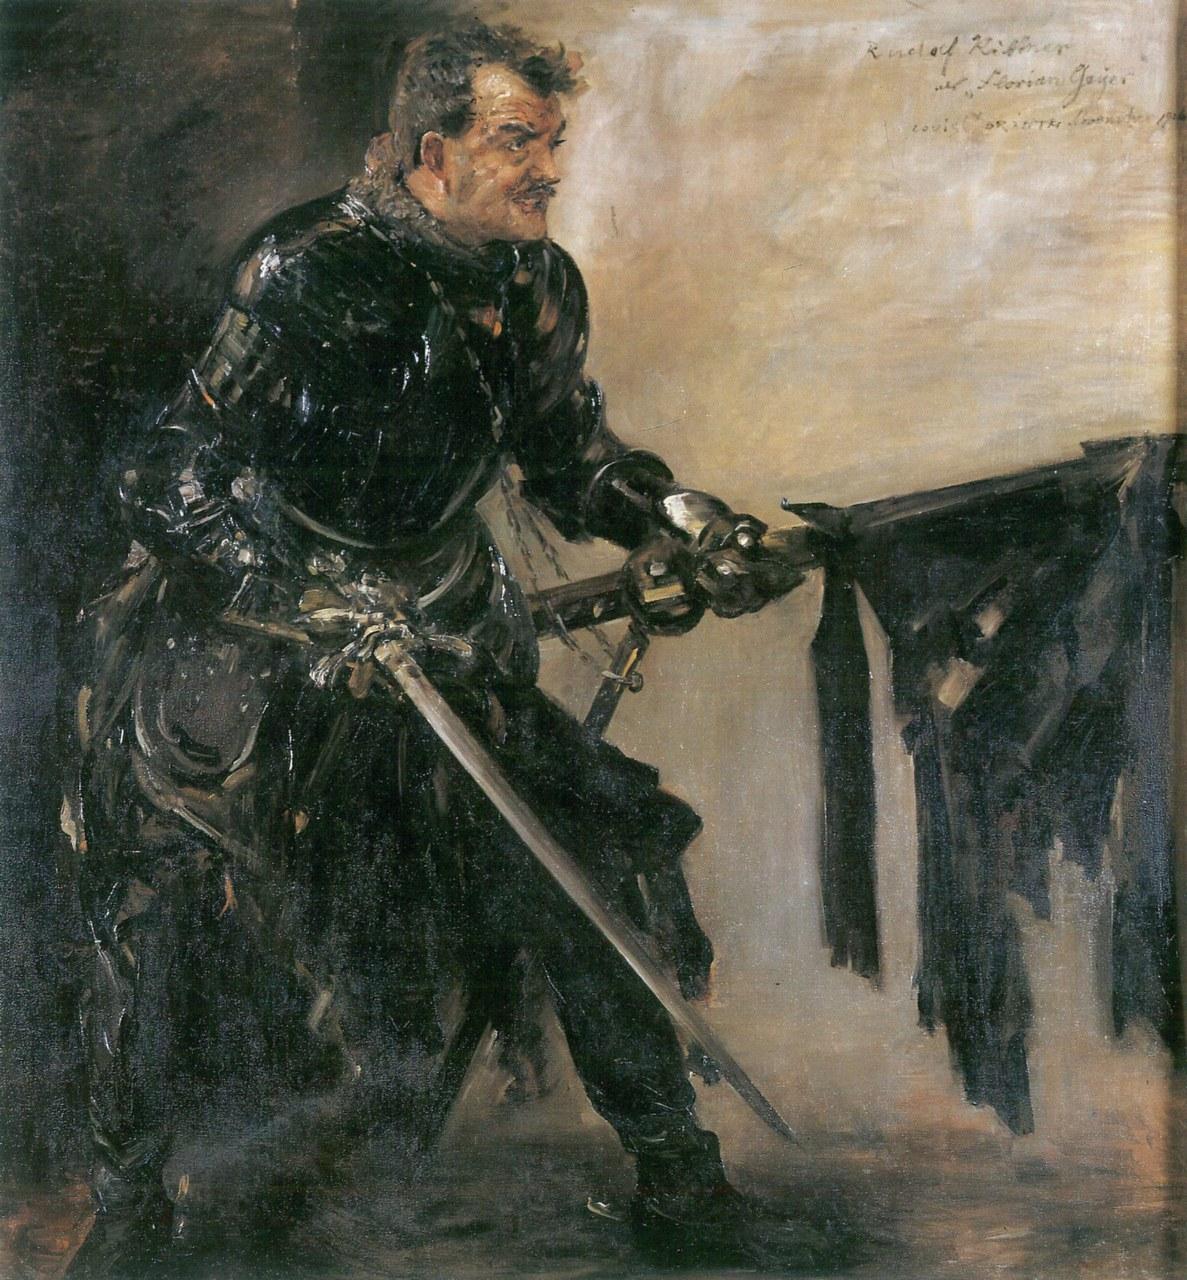 Fig. 3 Lovis Corinth, Rudolf Rittner nei panni di Florian Geyer di Hauptmann.